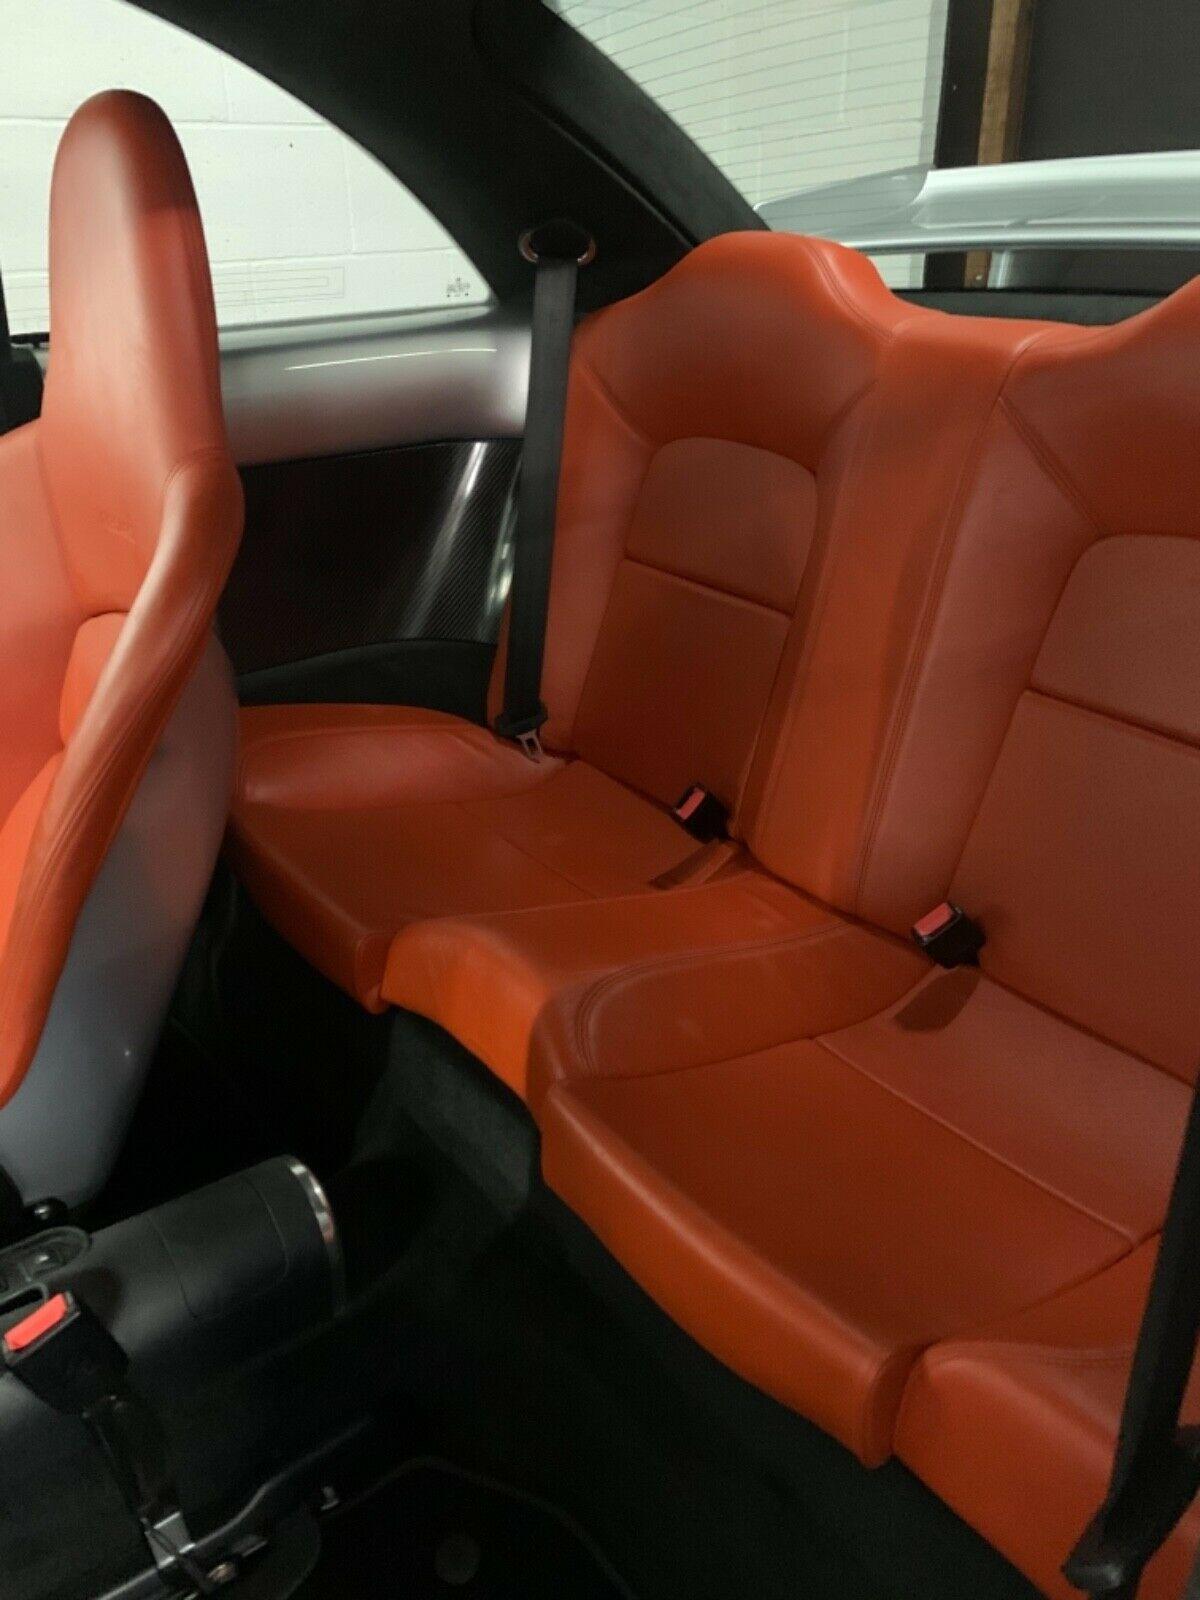 Volkswagen-Beetle-RSi-for-sale-9